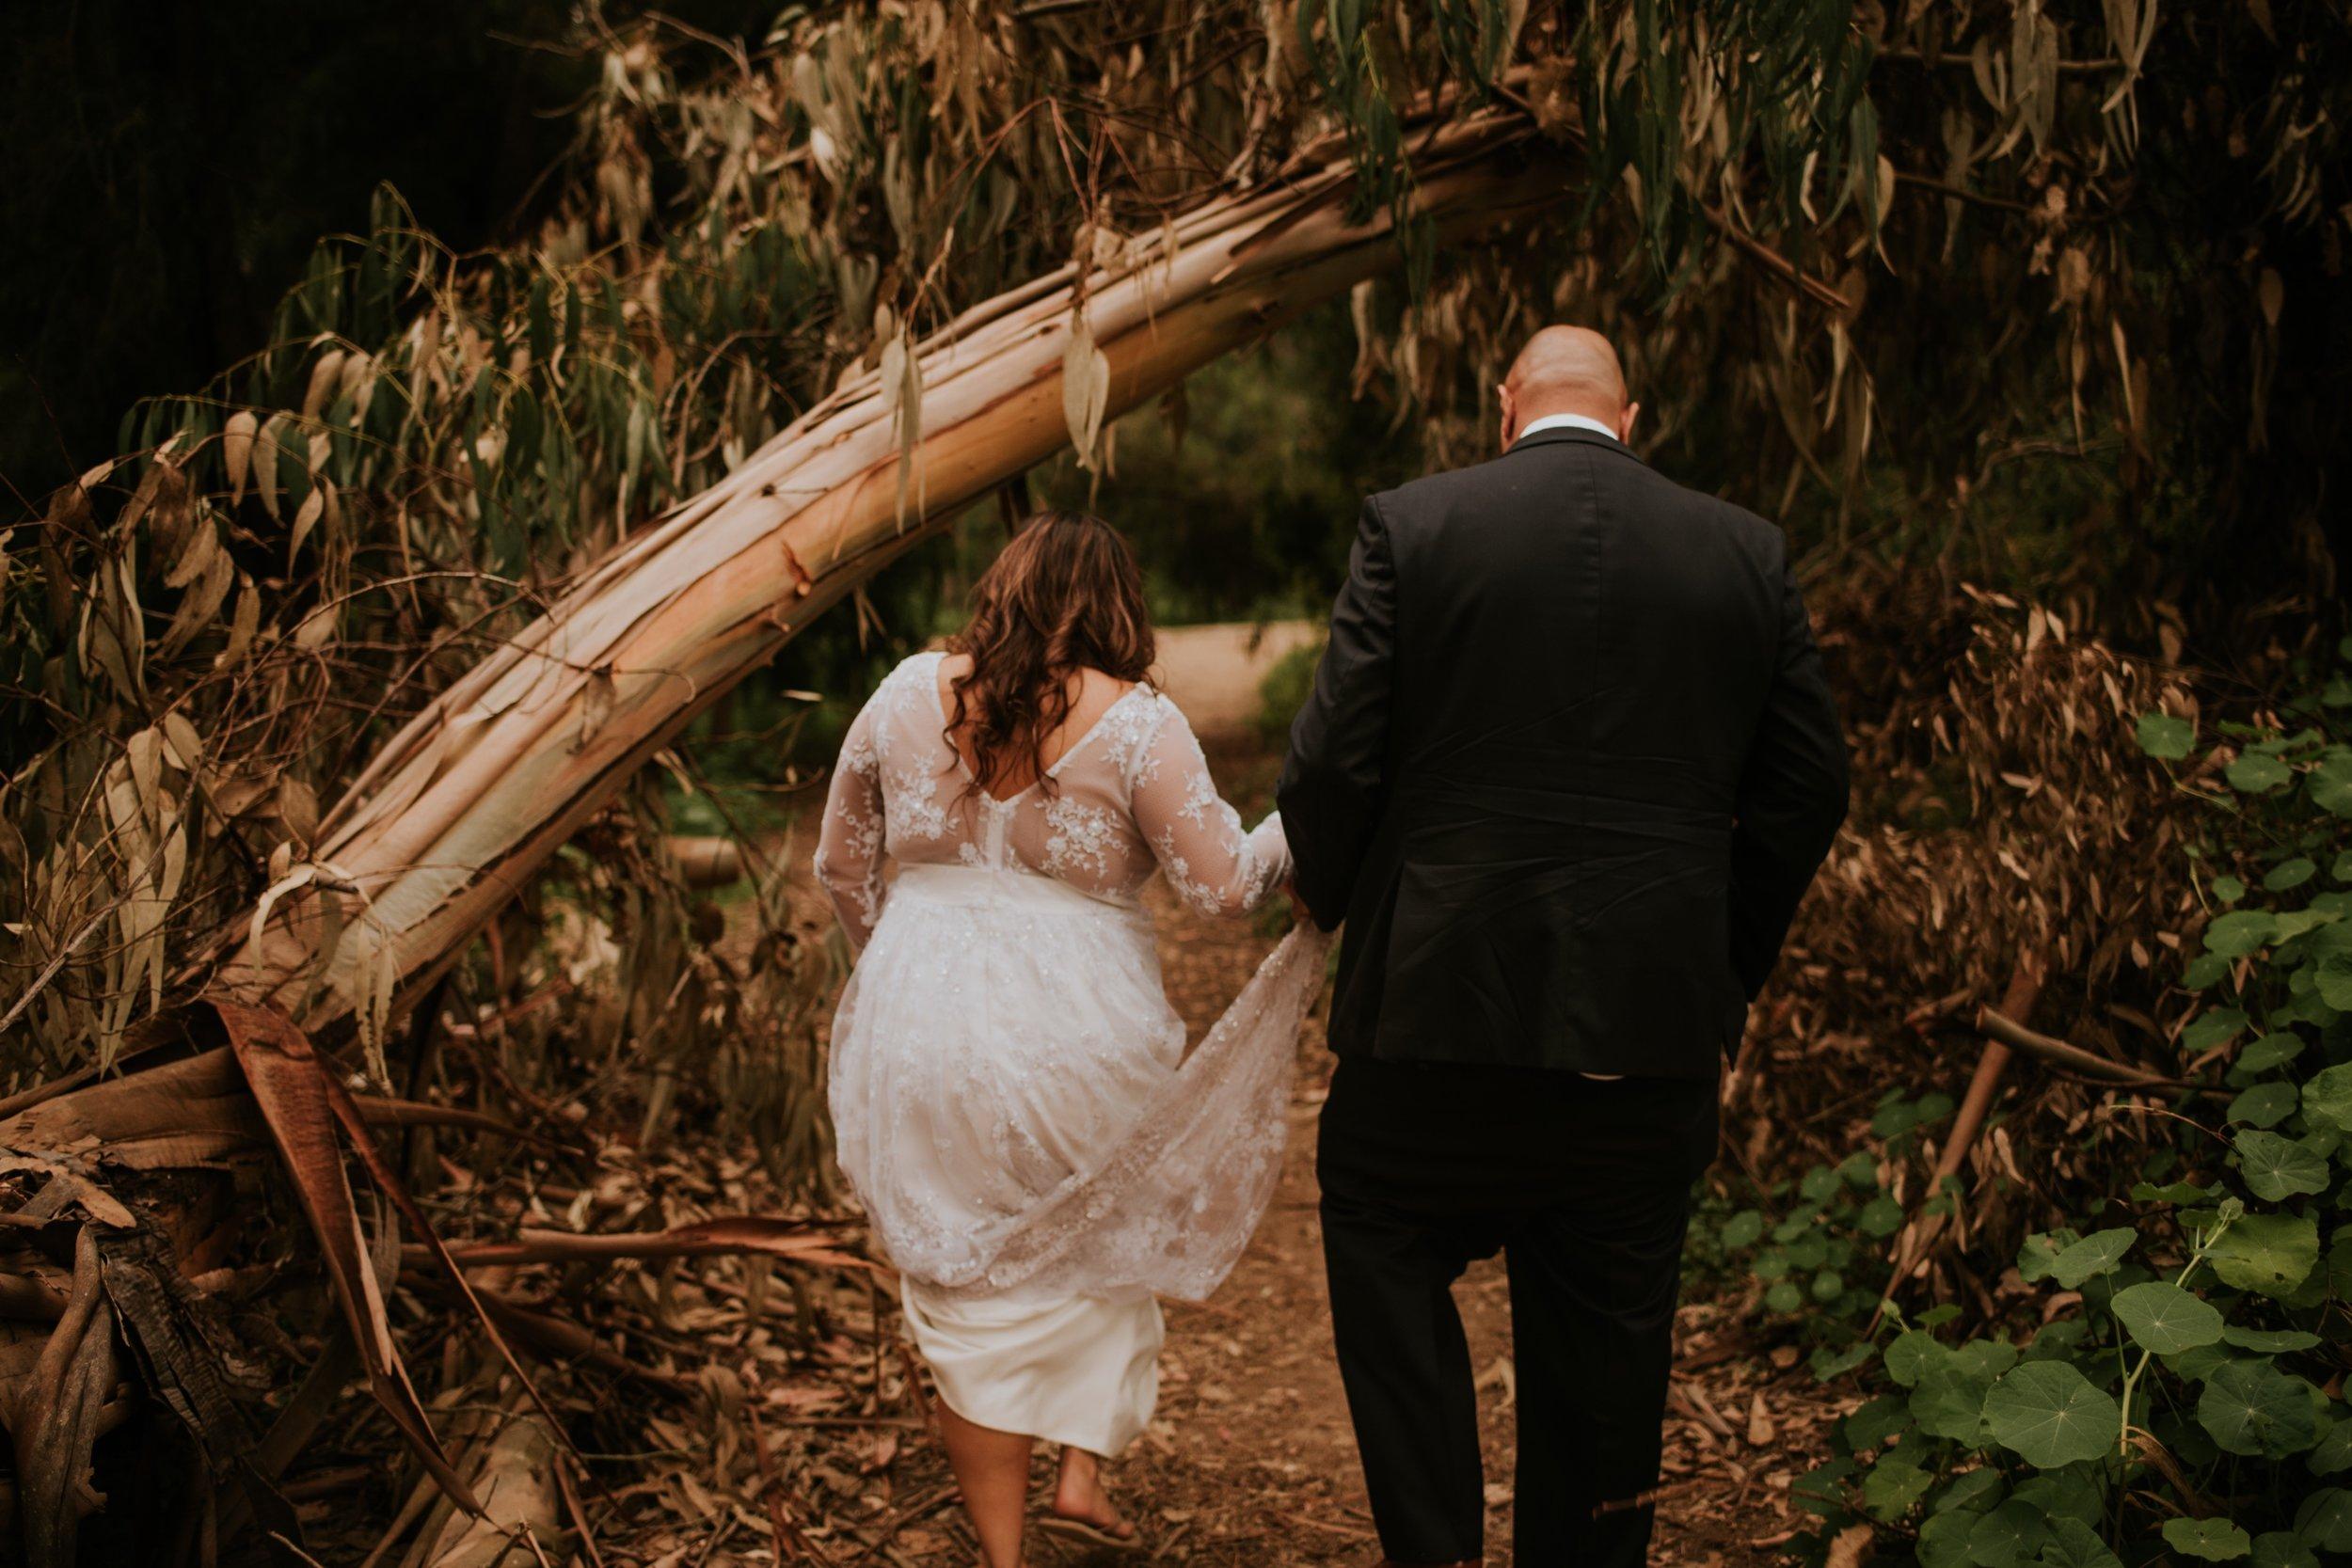 Ellwood Bluffs Santa Barbara Elopement | Carrie Rogers Photography | Santa Barbara Wedding Photographer | California Elopement Photographer | #weddingphotography #elopement